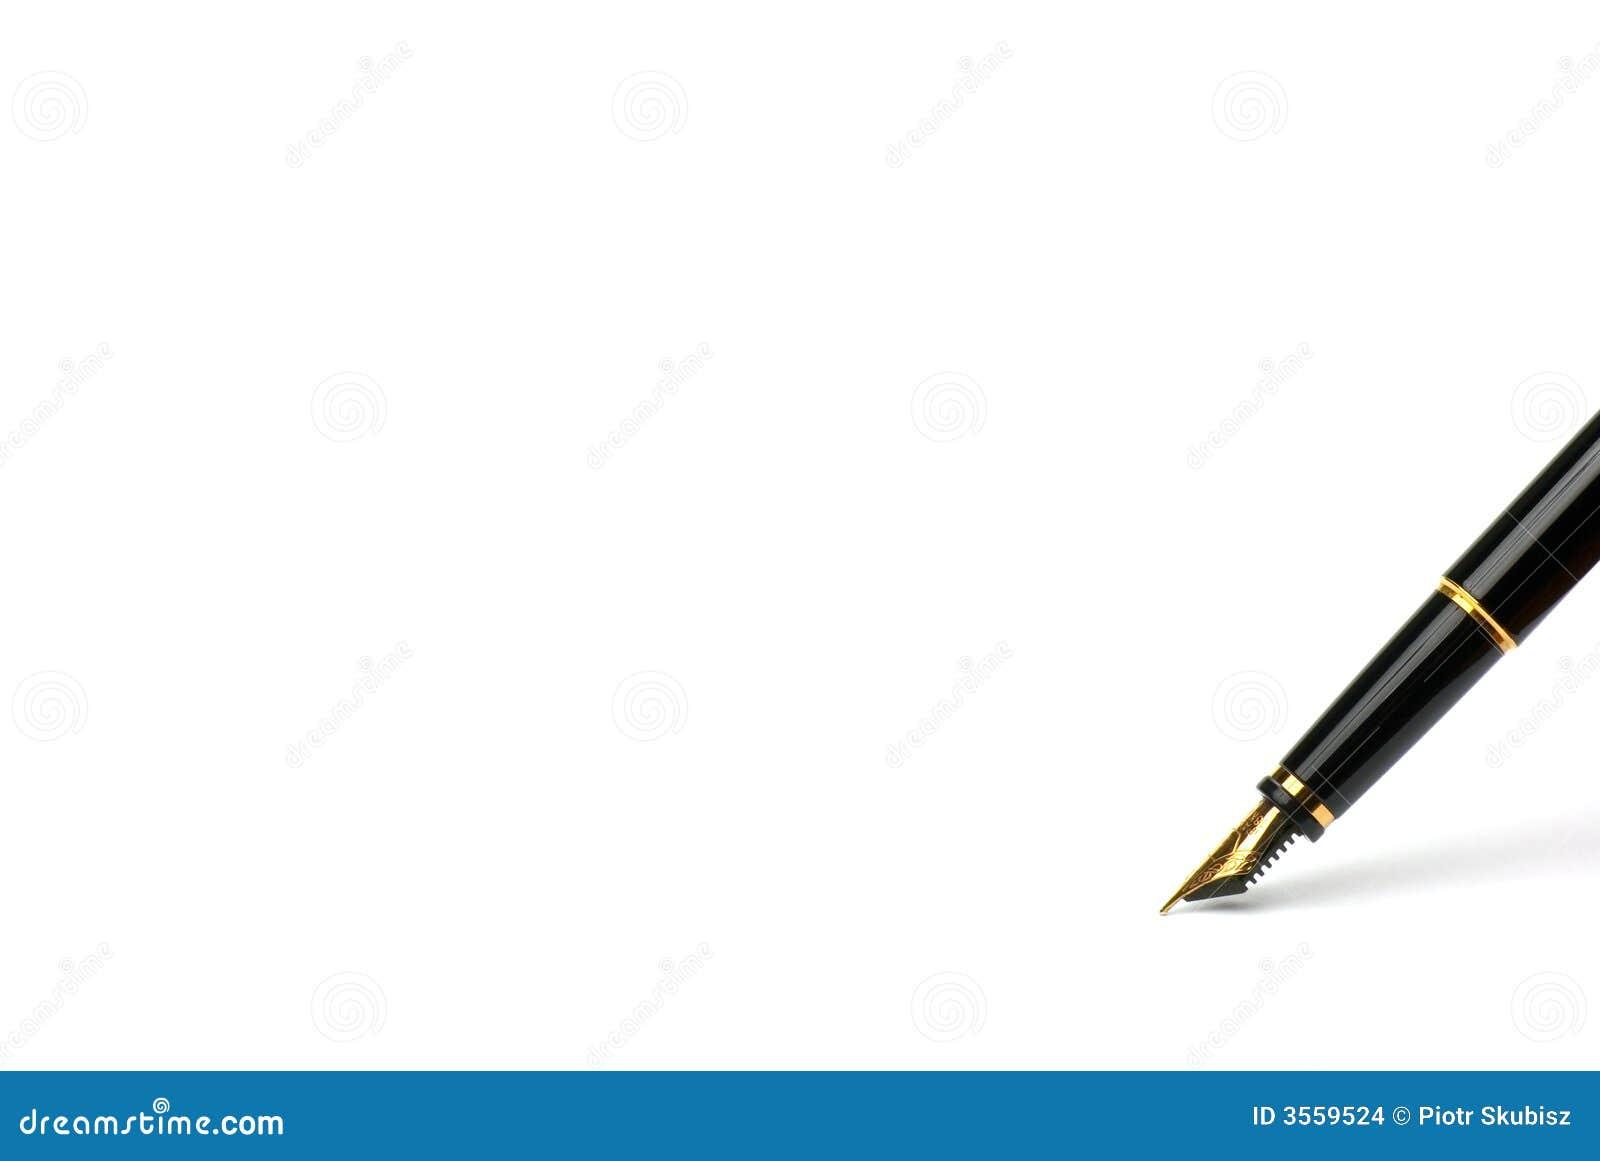 Penna esclusiva.